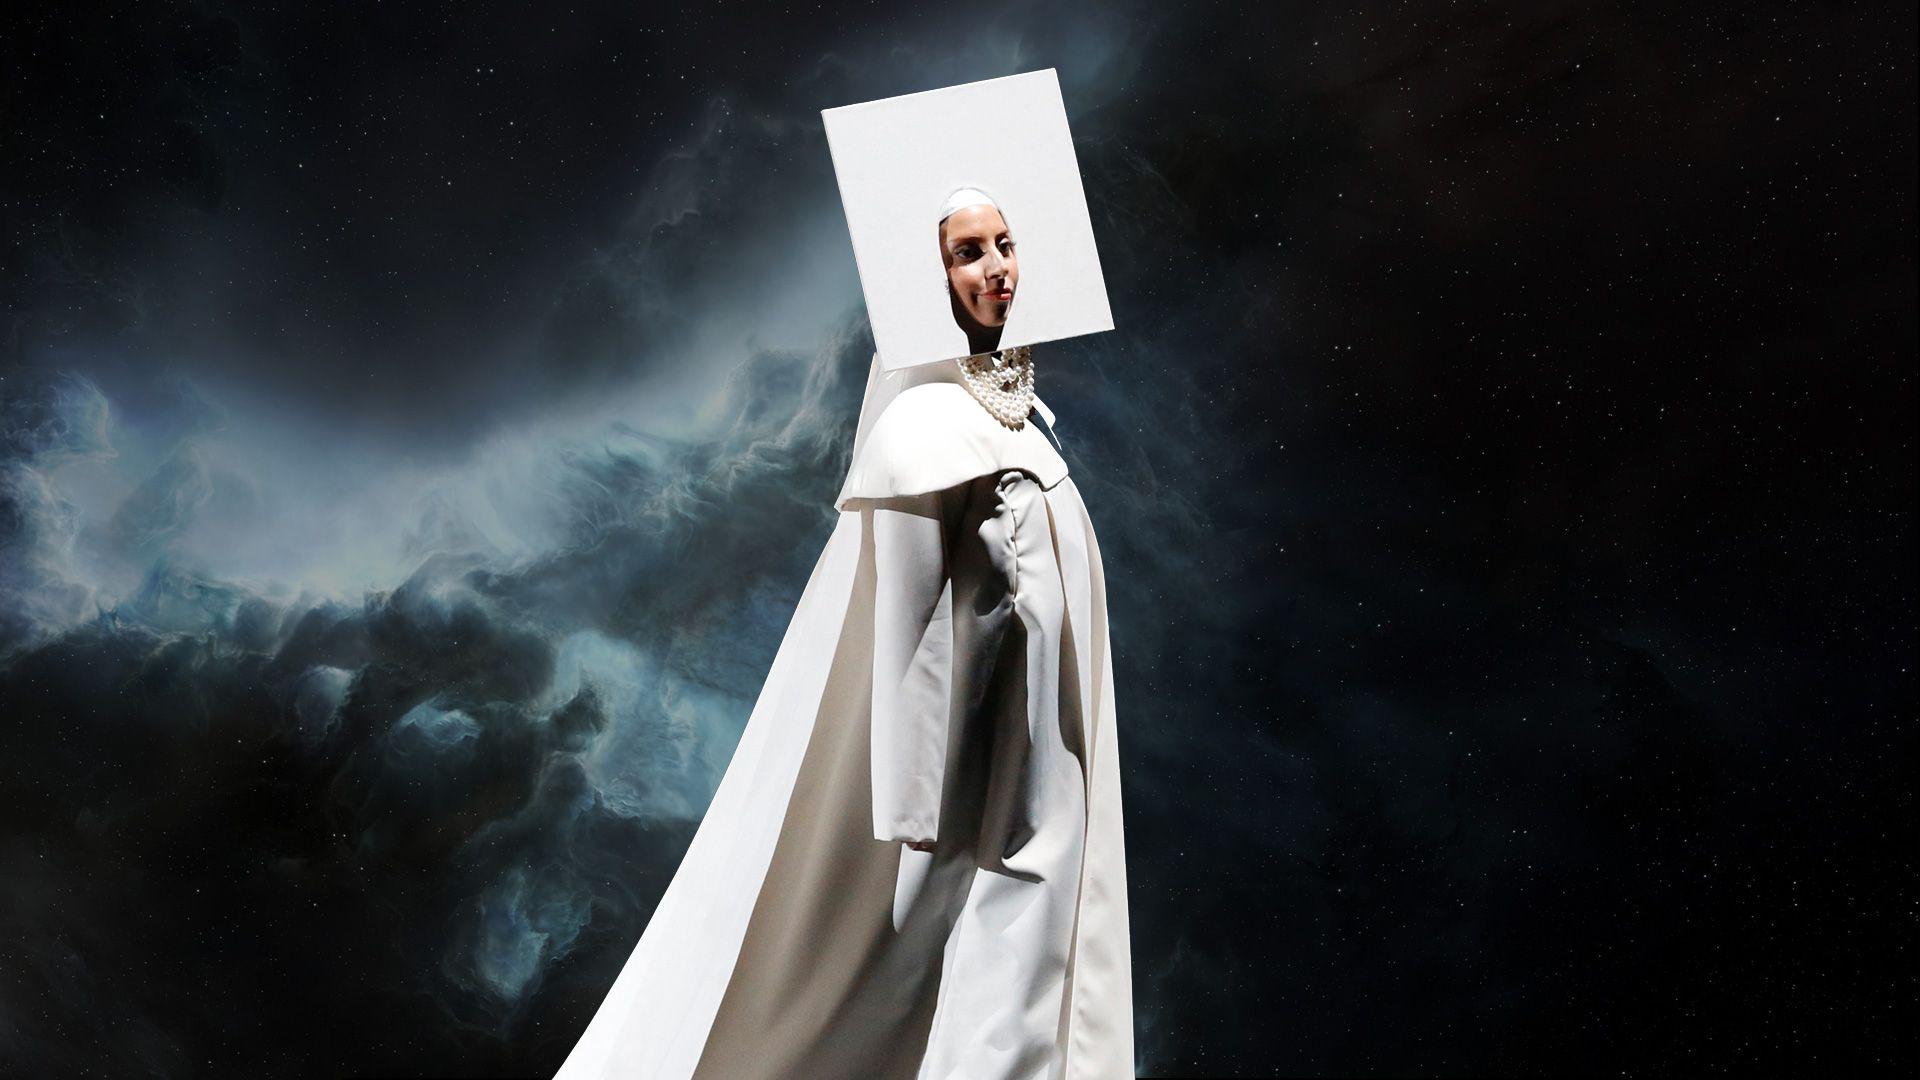 Lady Gaga Joanne Mobile Desktop Wallpaper Album on Imgur